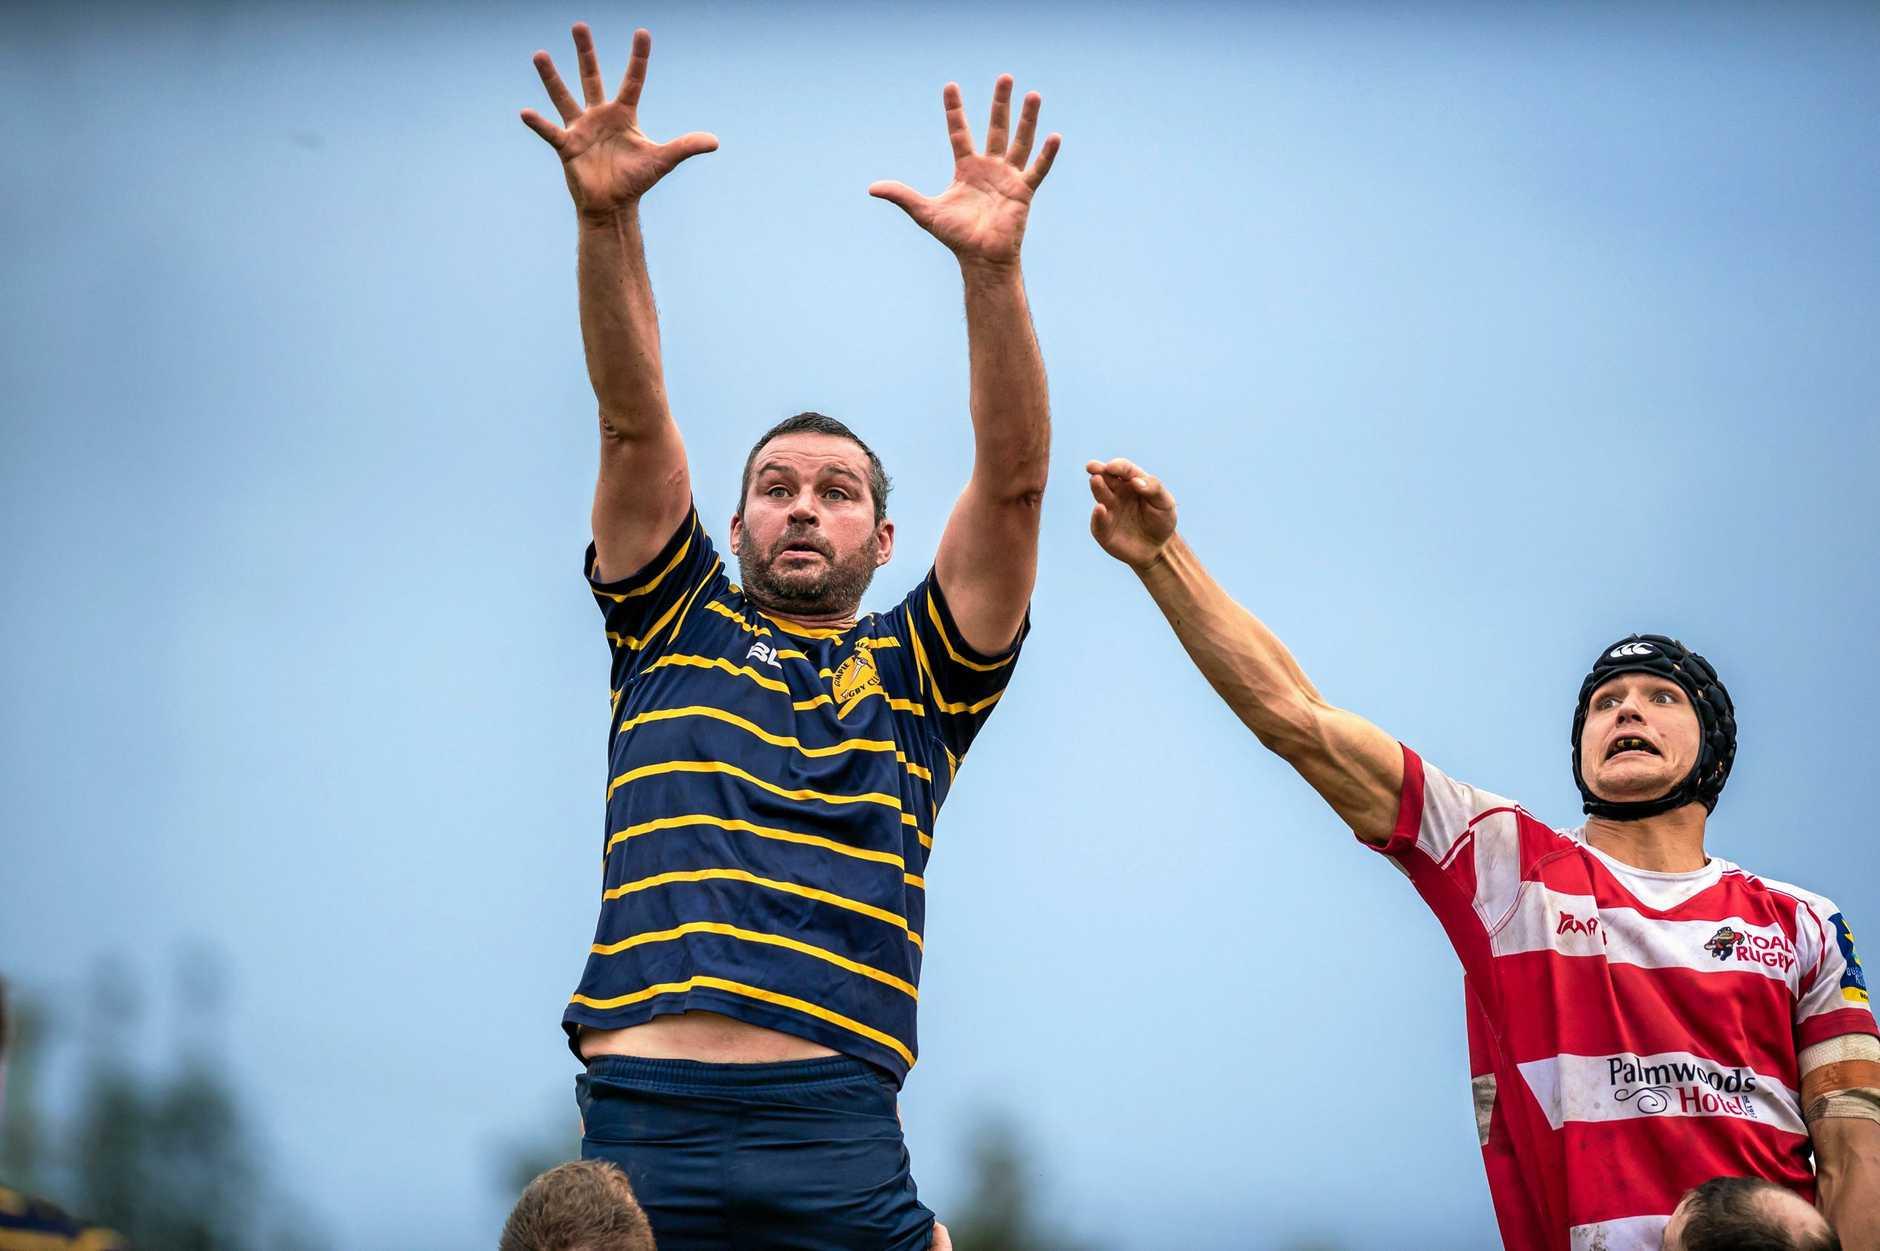 Rugby Union - Gympie Hammers vs Nambour Toads Men - Jason Flikweert Hammers